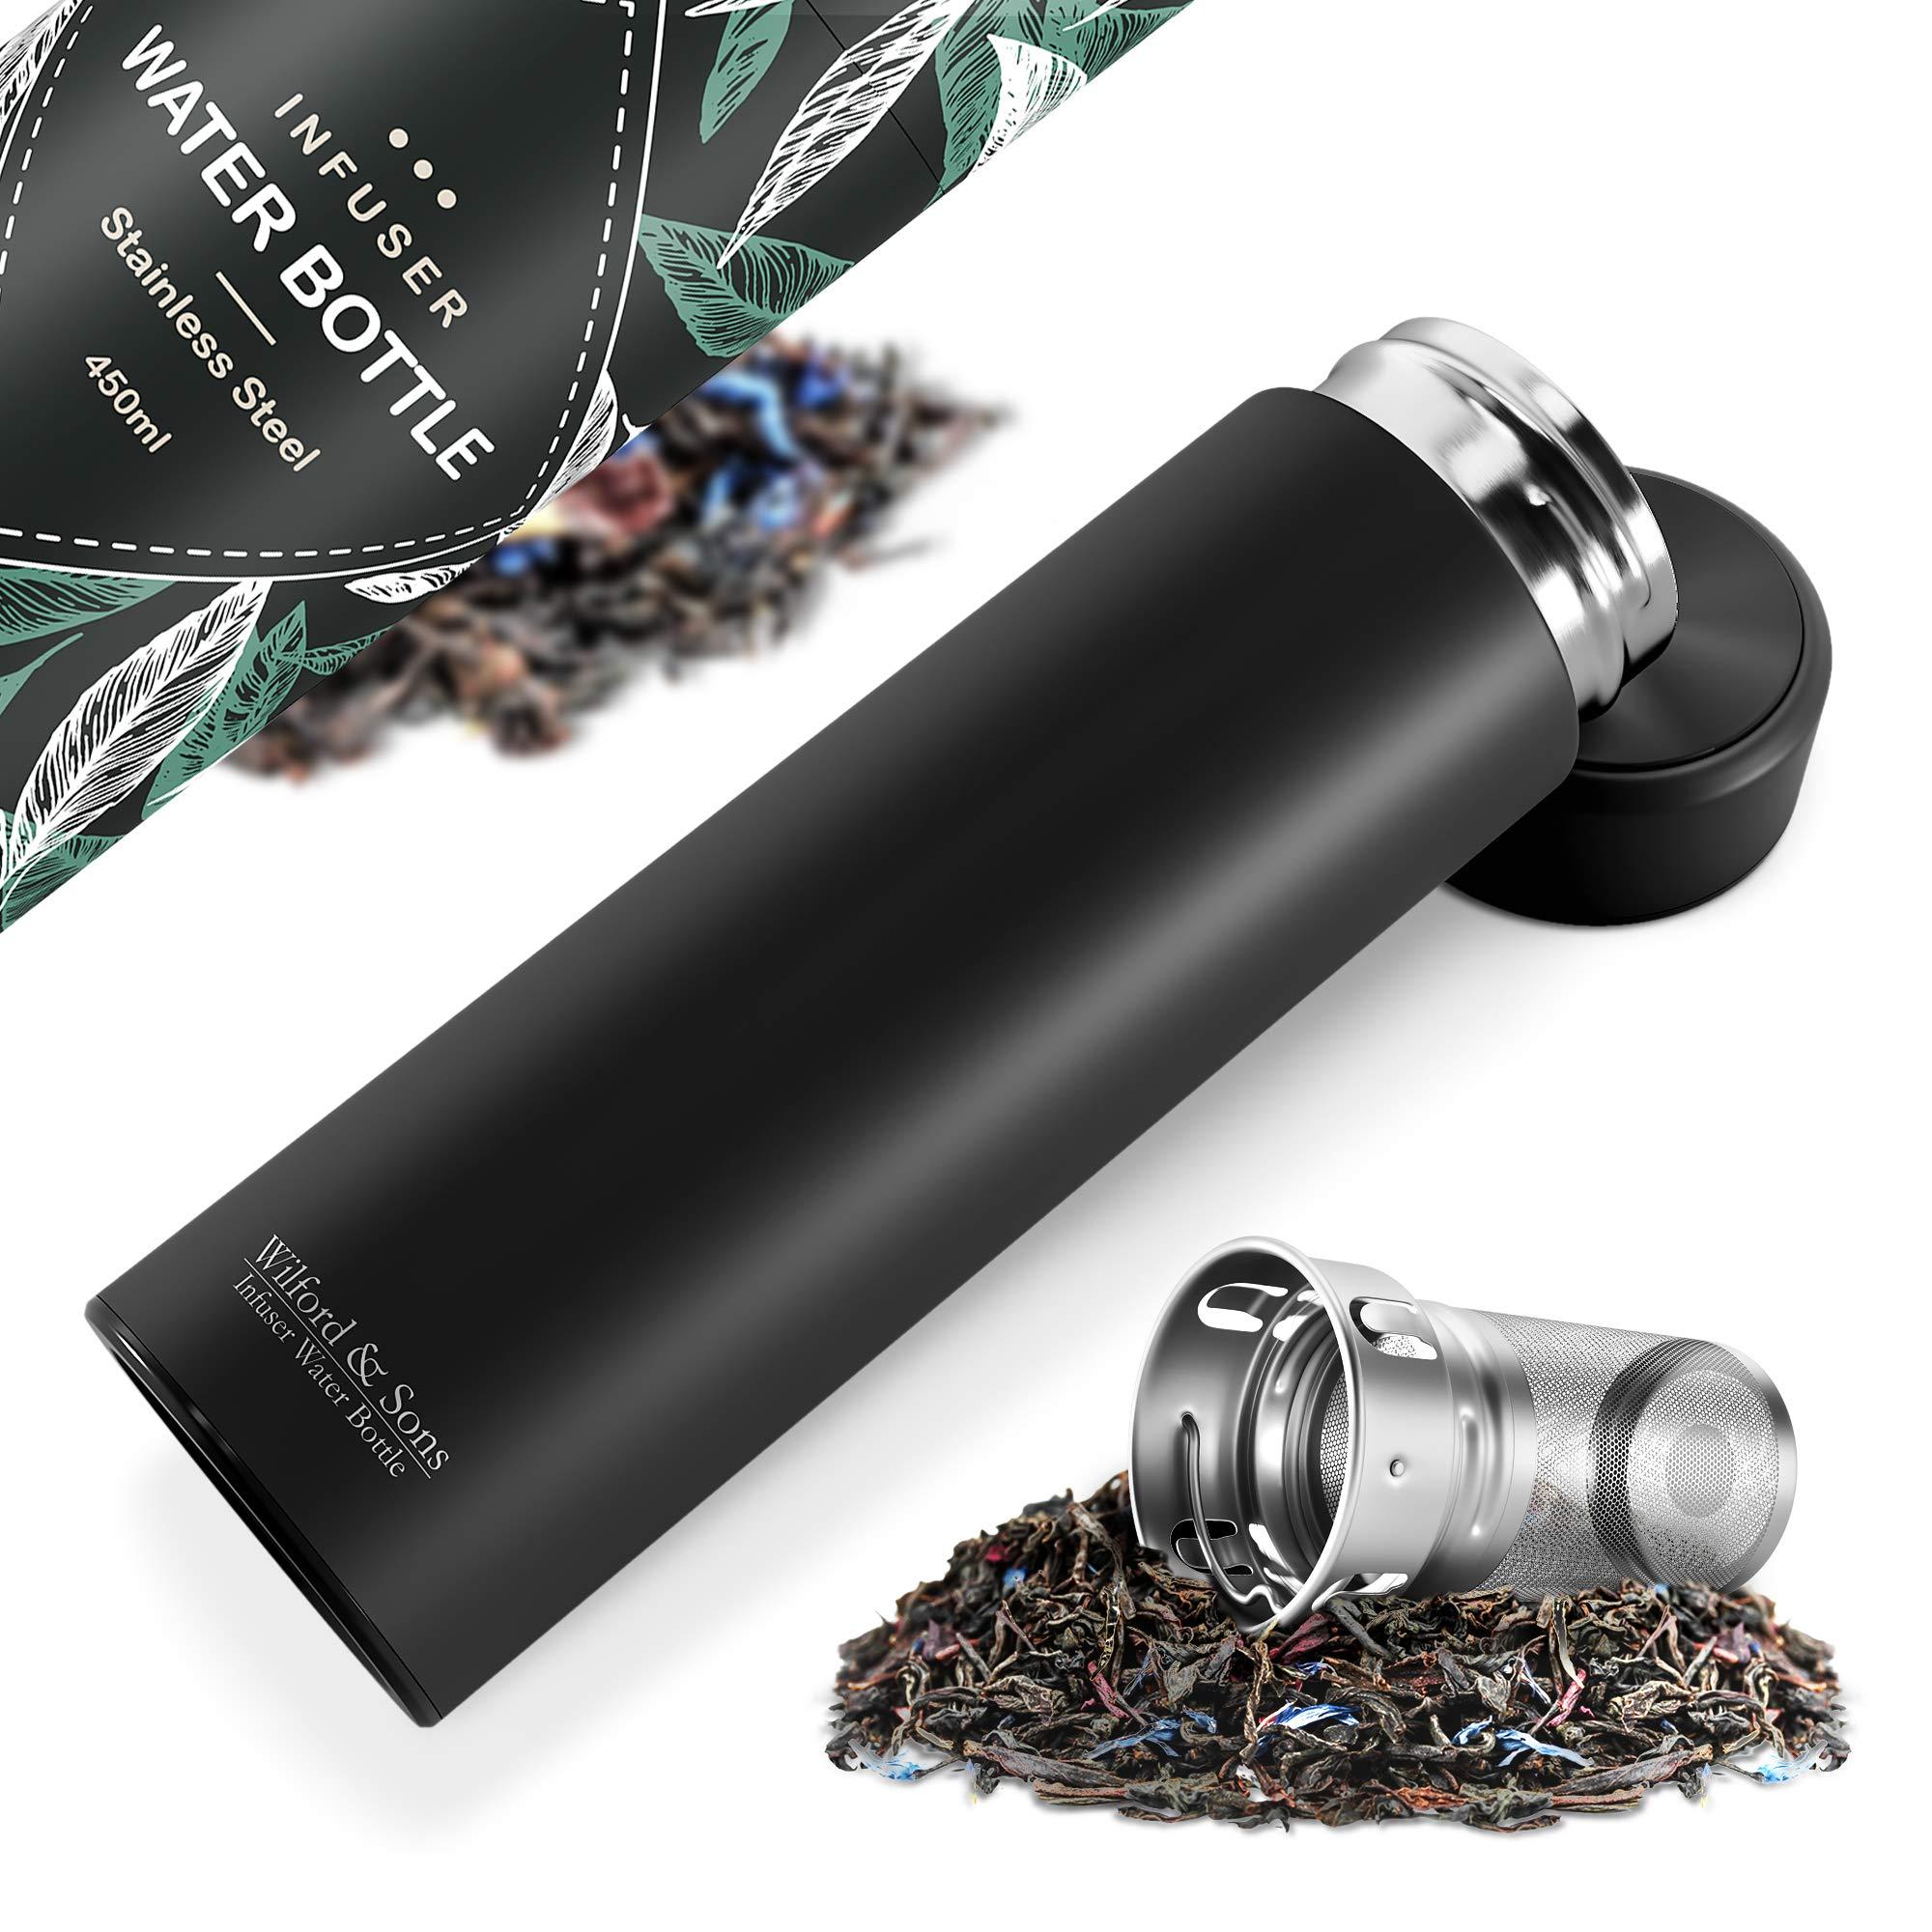 Thermos Water Bottle Stainless Steel Drinkware Office Tea Infuser Vacuum Flasks